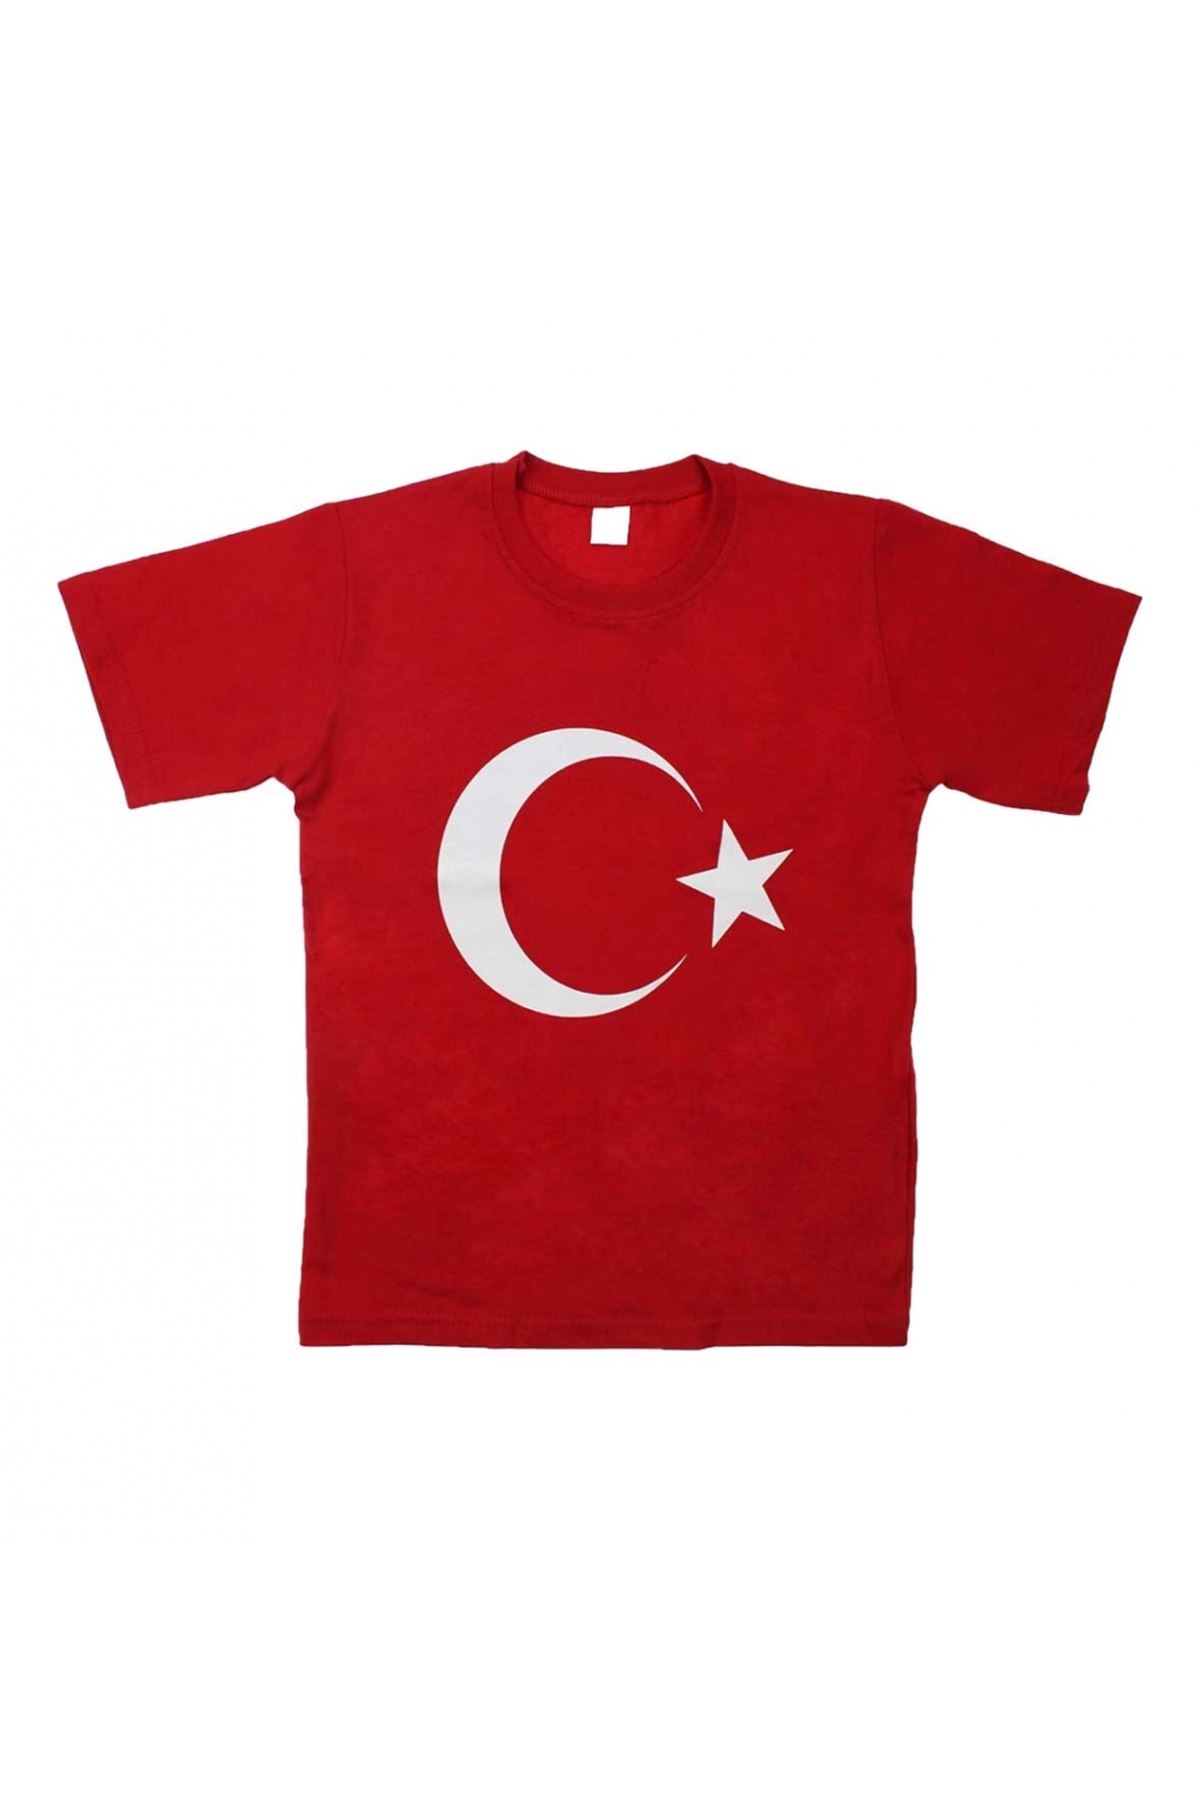 Kırmızı Bayrak Baskılı S-M-L-XL Tişört